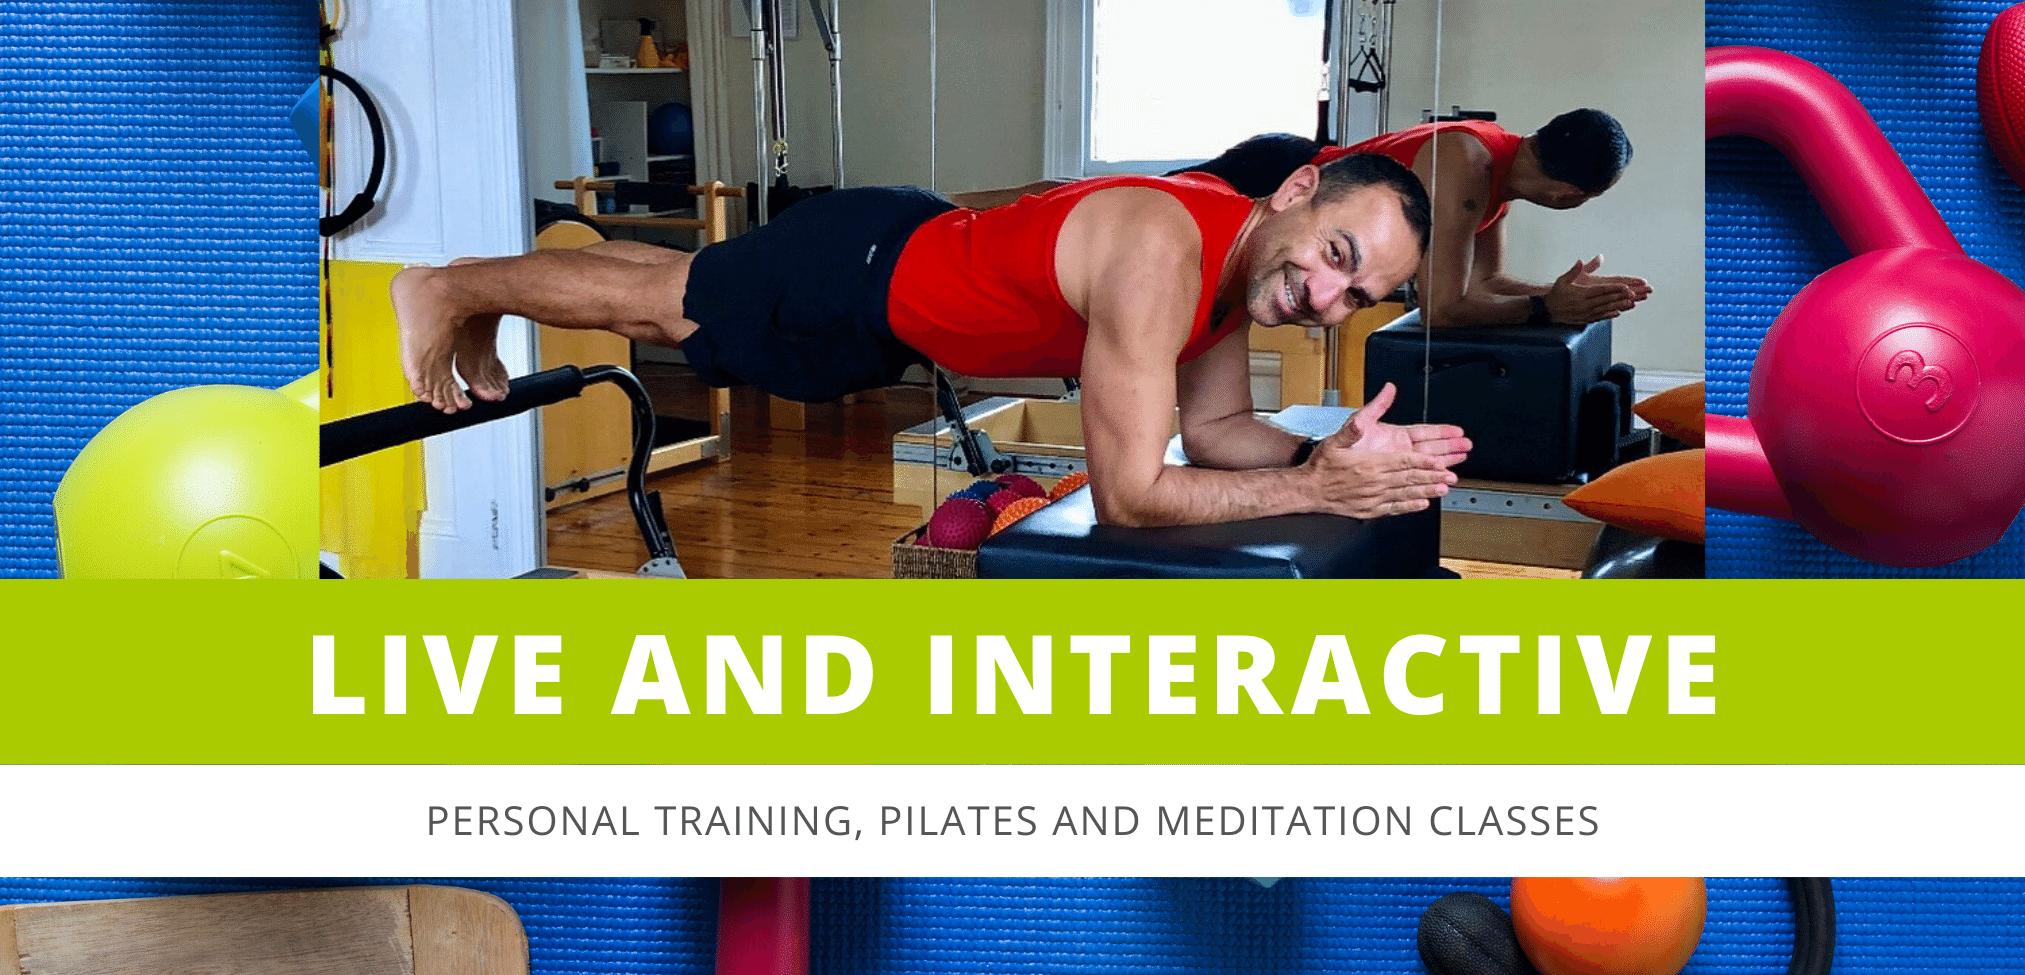 Vita health and fitness classes